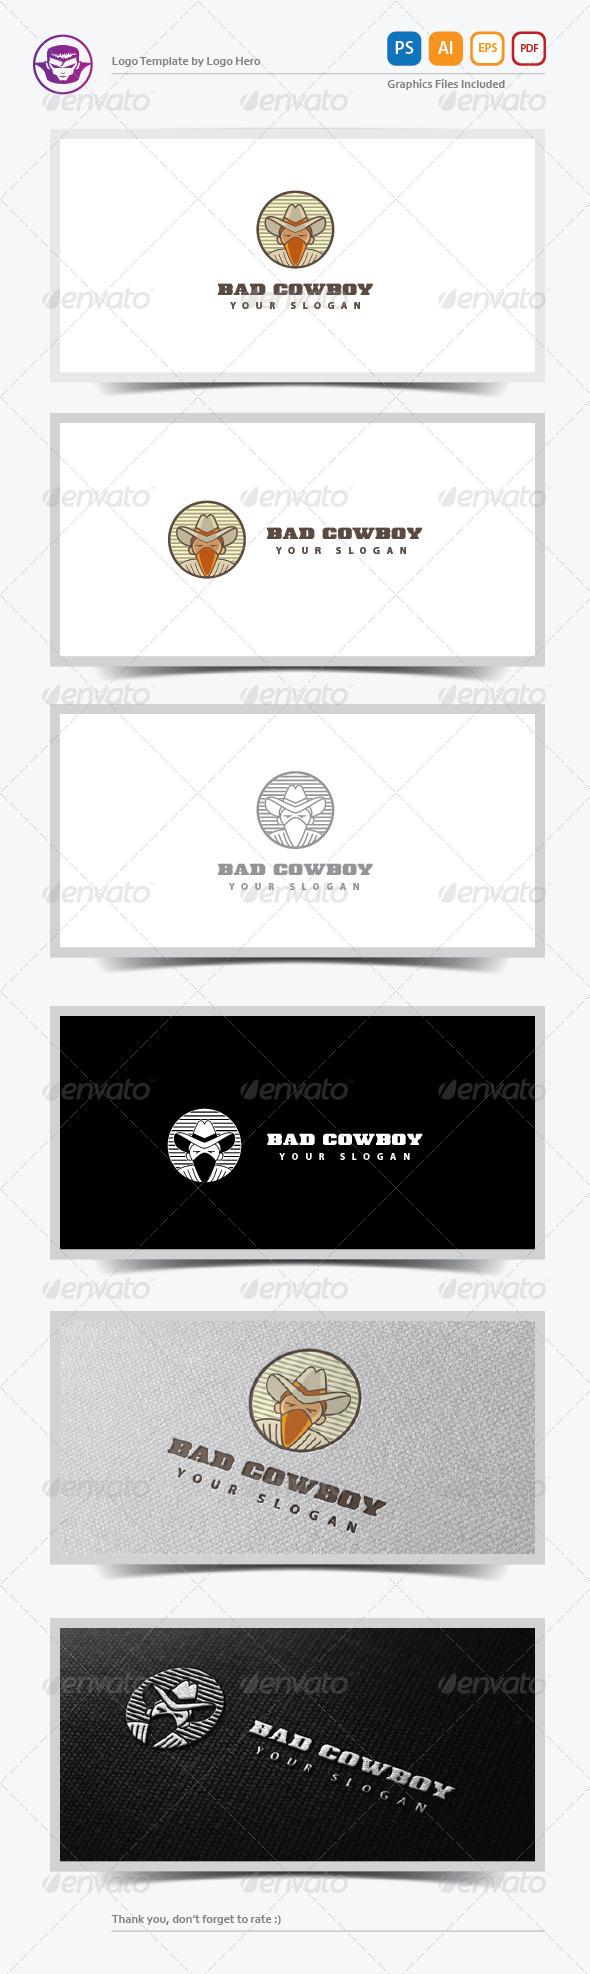 GraphicRiver Bad Cowboy Logo Template 6419036